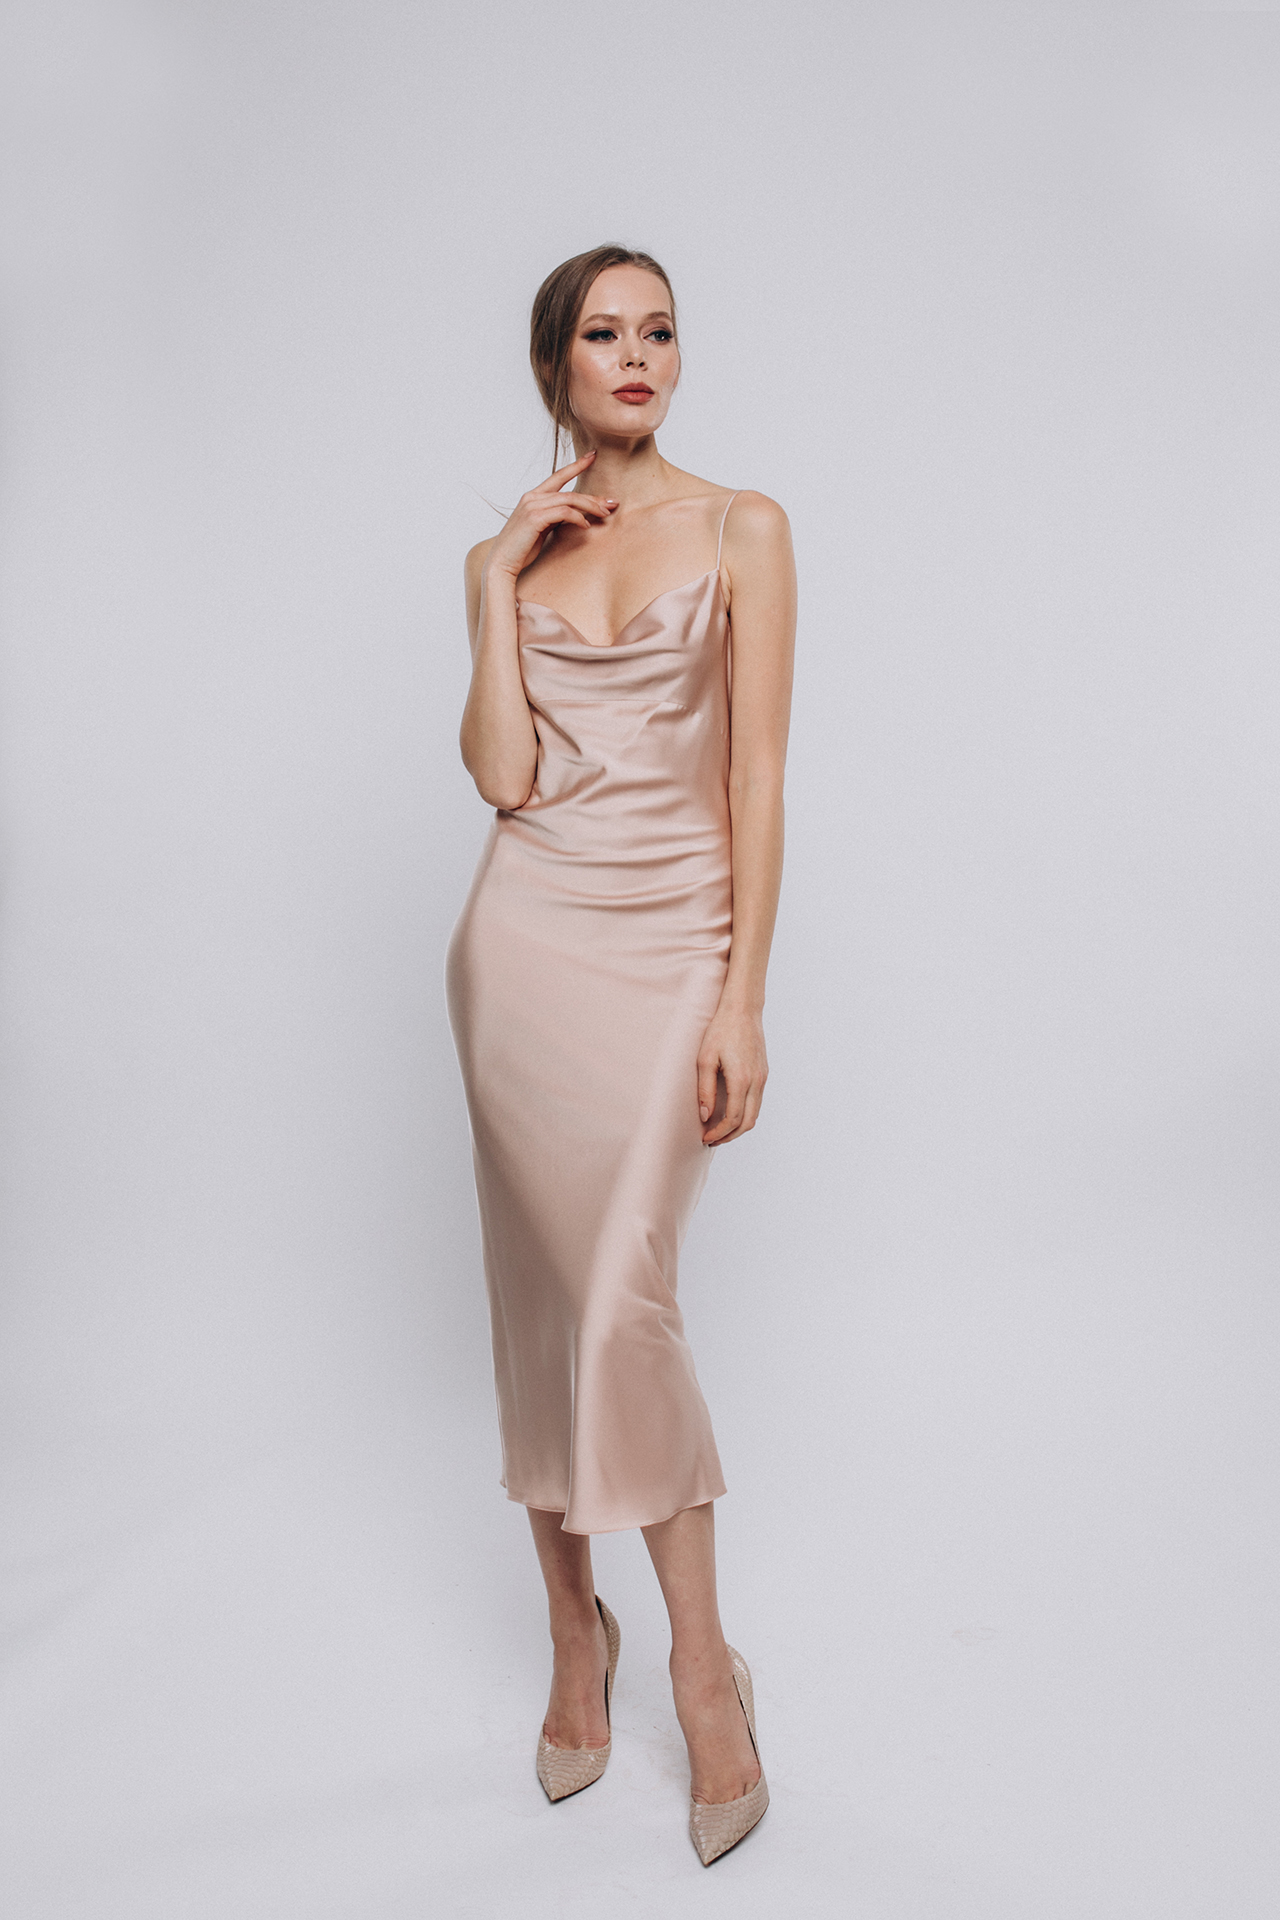 Cowl Silk Satin Slip Dress Midi Champagne Beige Silk Bridesmaid Dress Champagne Beige Silk Cocktail Dress Silk Wrap Dress Midi Floria 3 Pearl Fashion Group,Can You Add A Train To A Wedding Dress